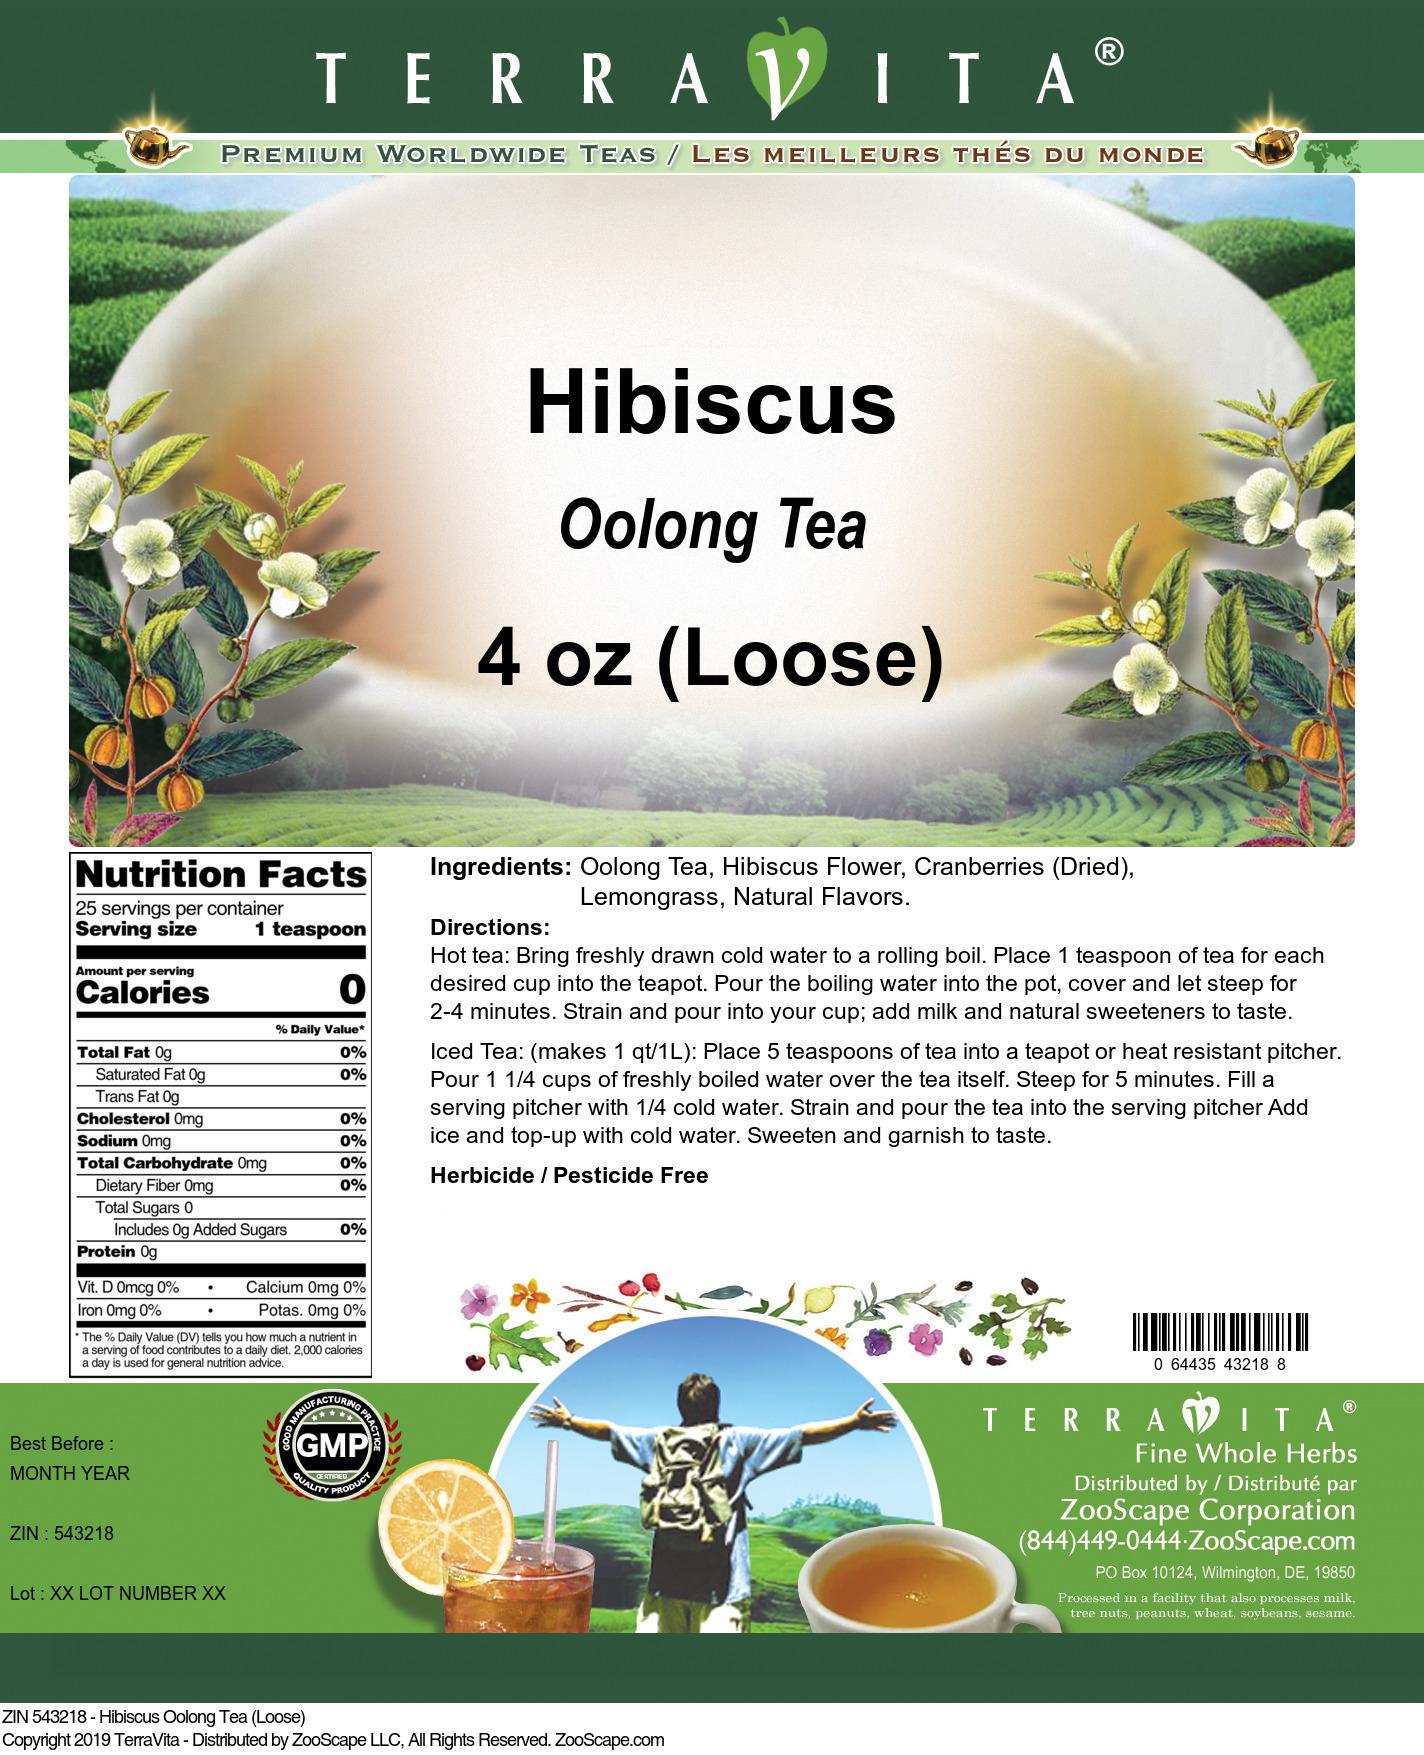 Hibiscus Oolong Tea (Loose)